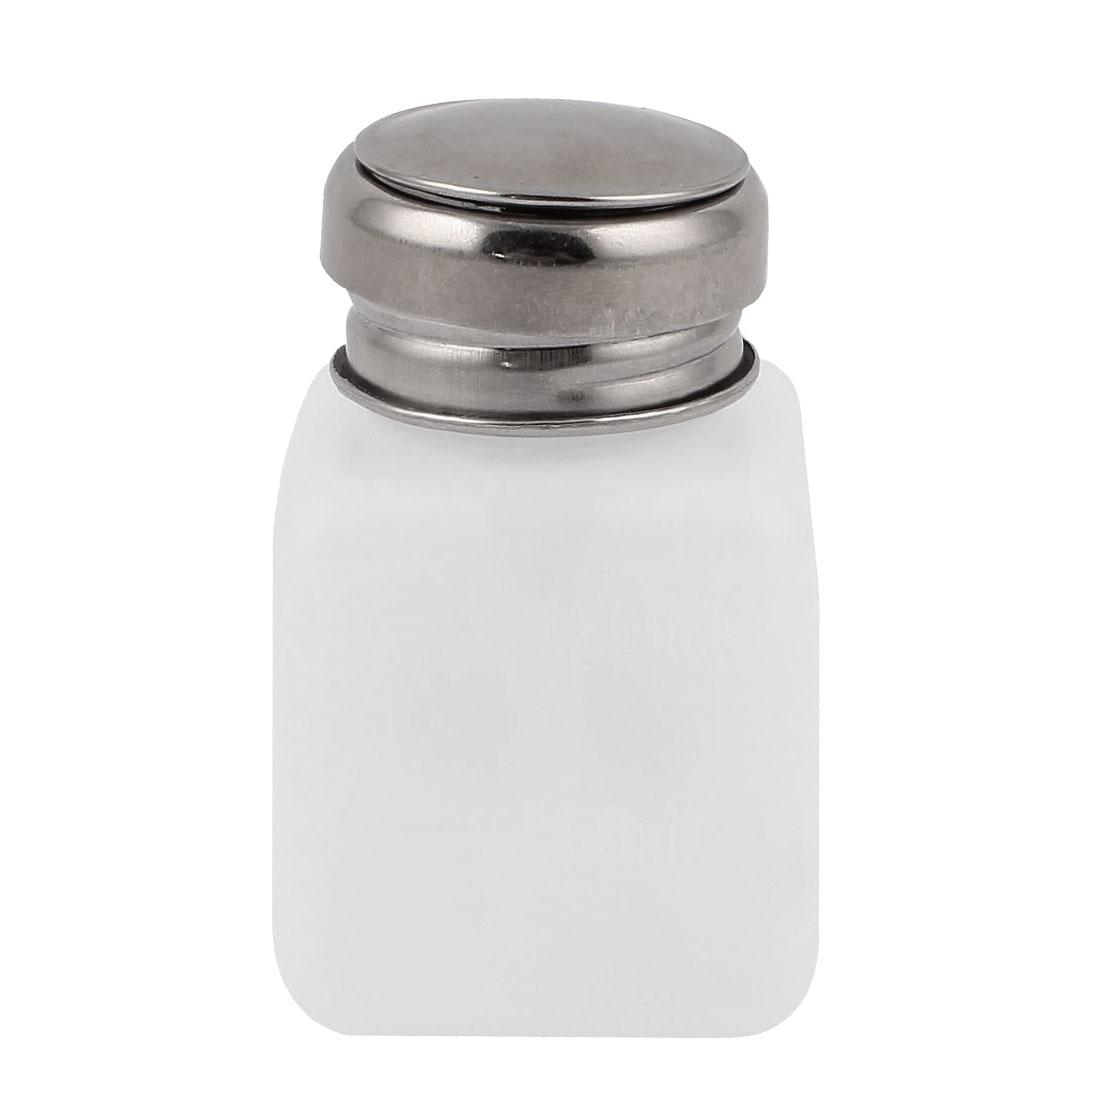 120ml Nail Polish Remover Liquid Alcohol Press Pumping Dispenser Bottle